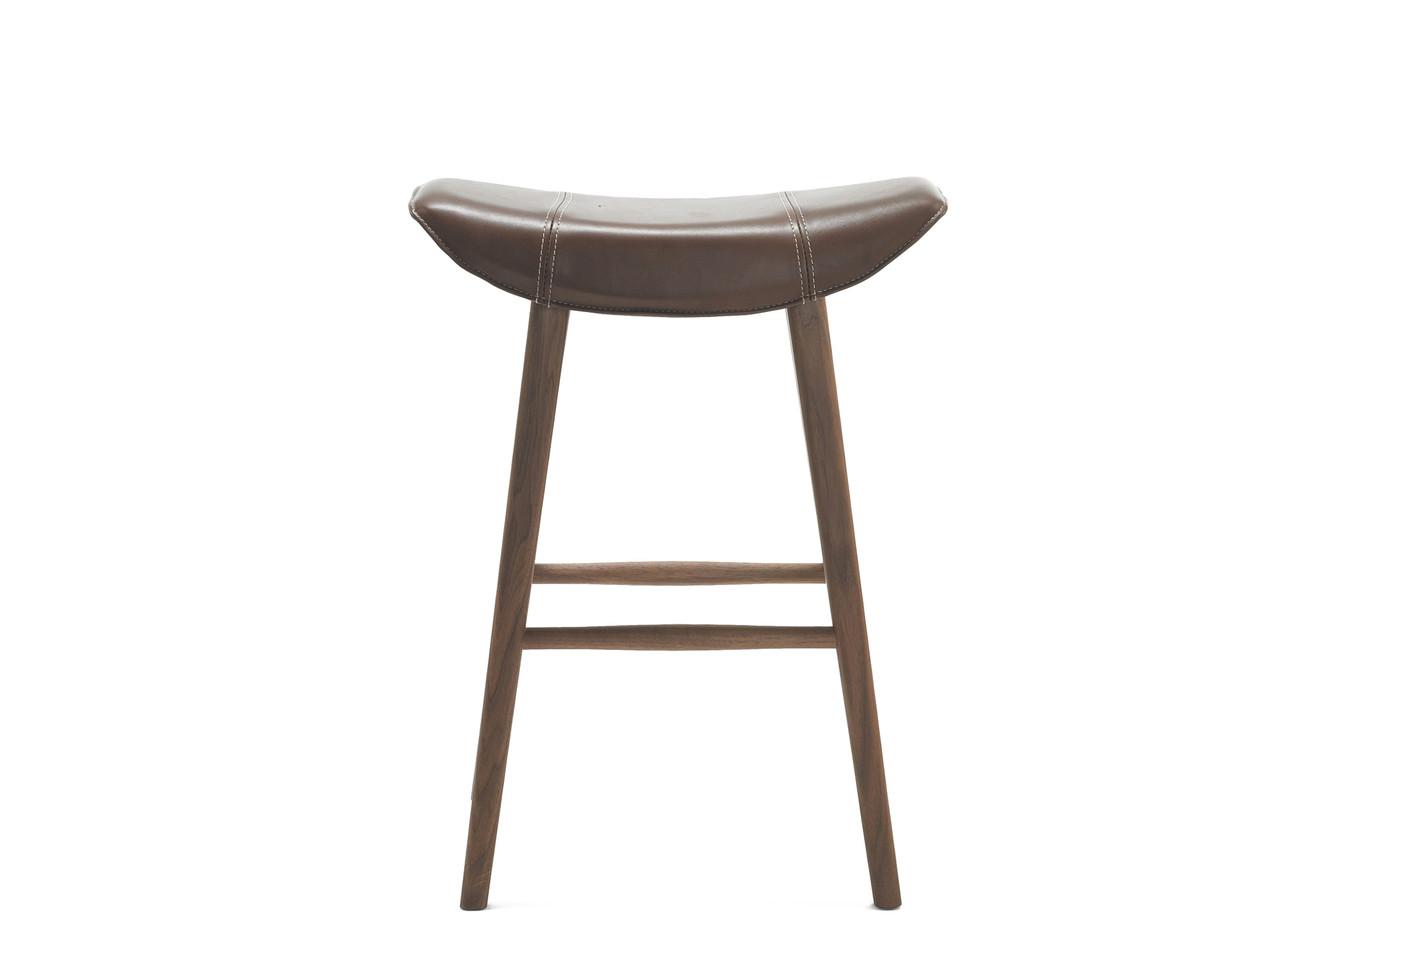 Kya kitchen stool with wooden frame by Freifrau   STYLEPARK